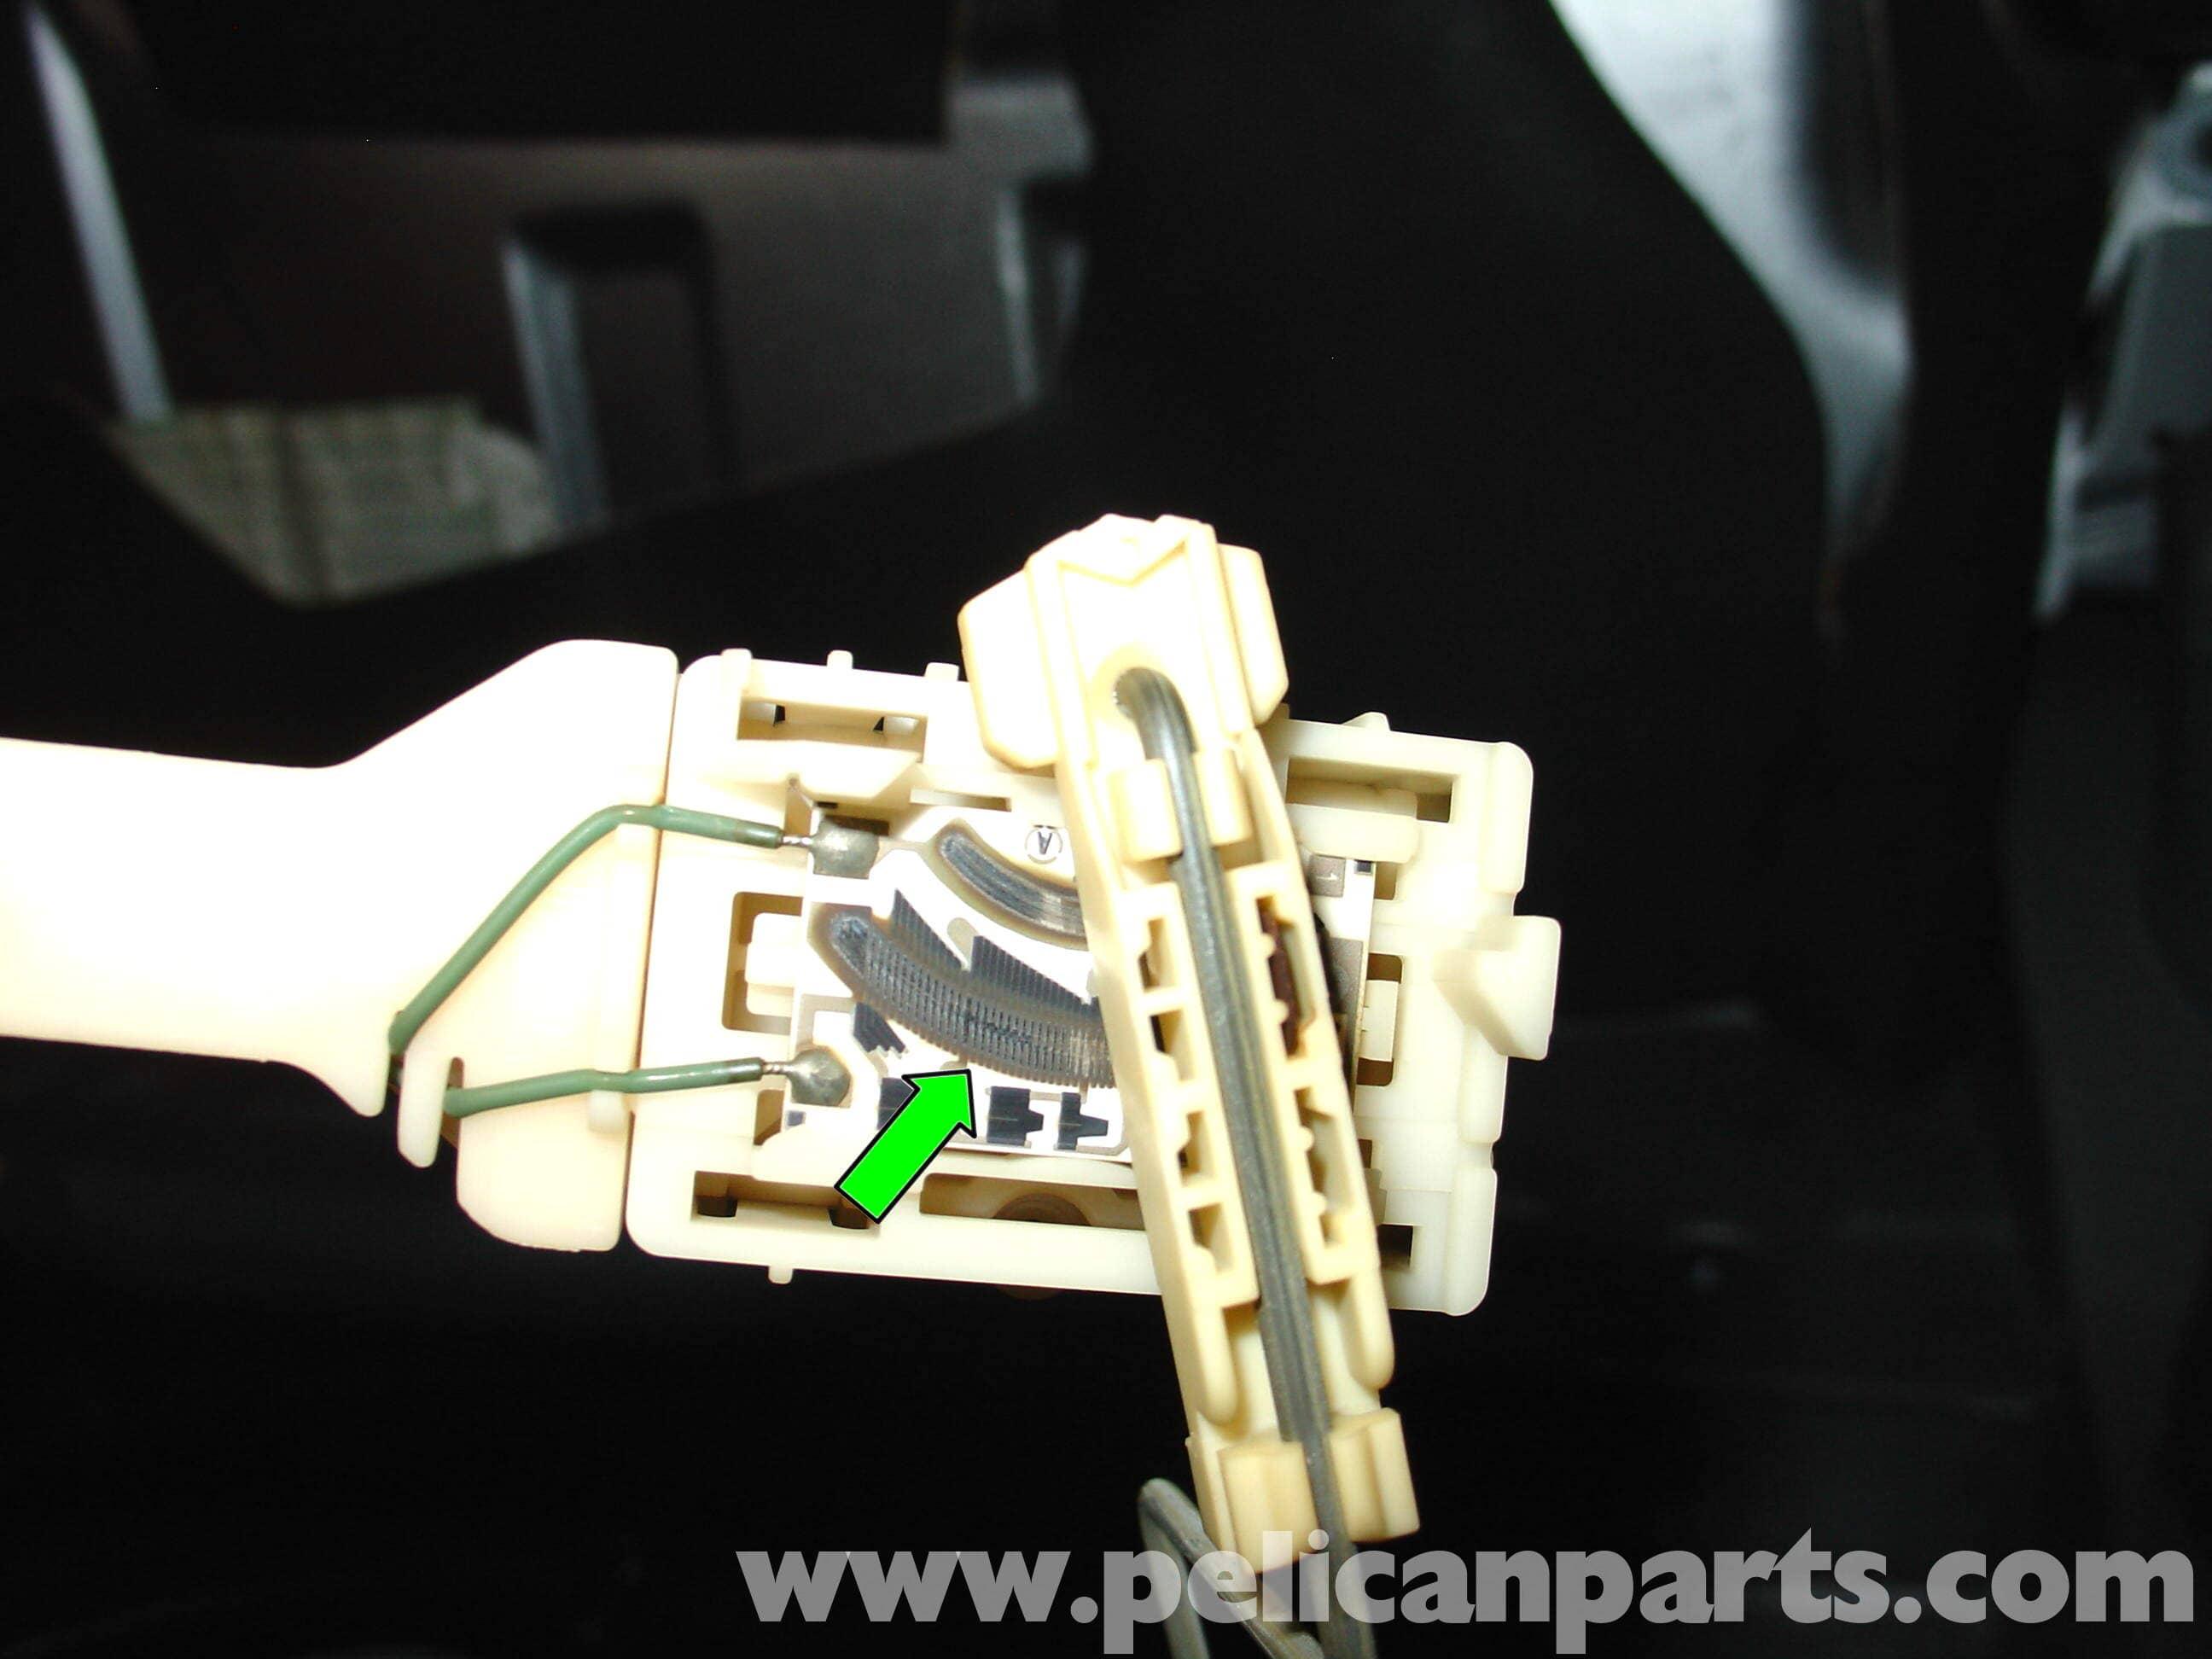 Mercedes benz w210 fuel level sender replacement 1996 03 for Replacement parts for mercedes benz